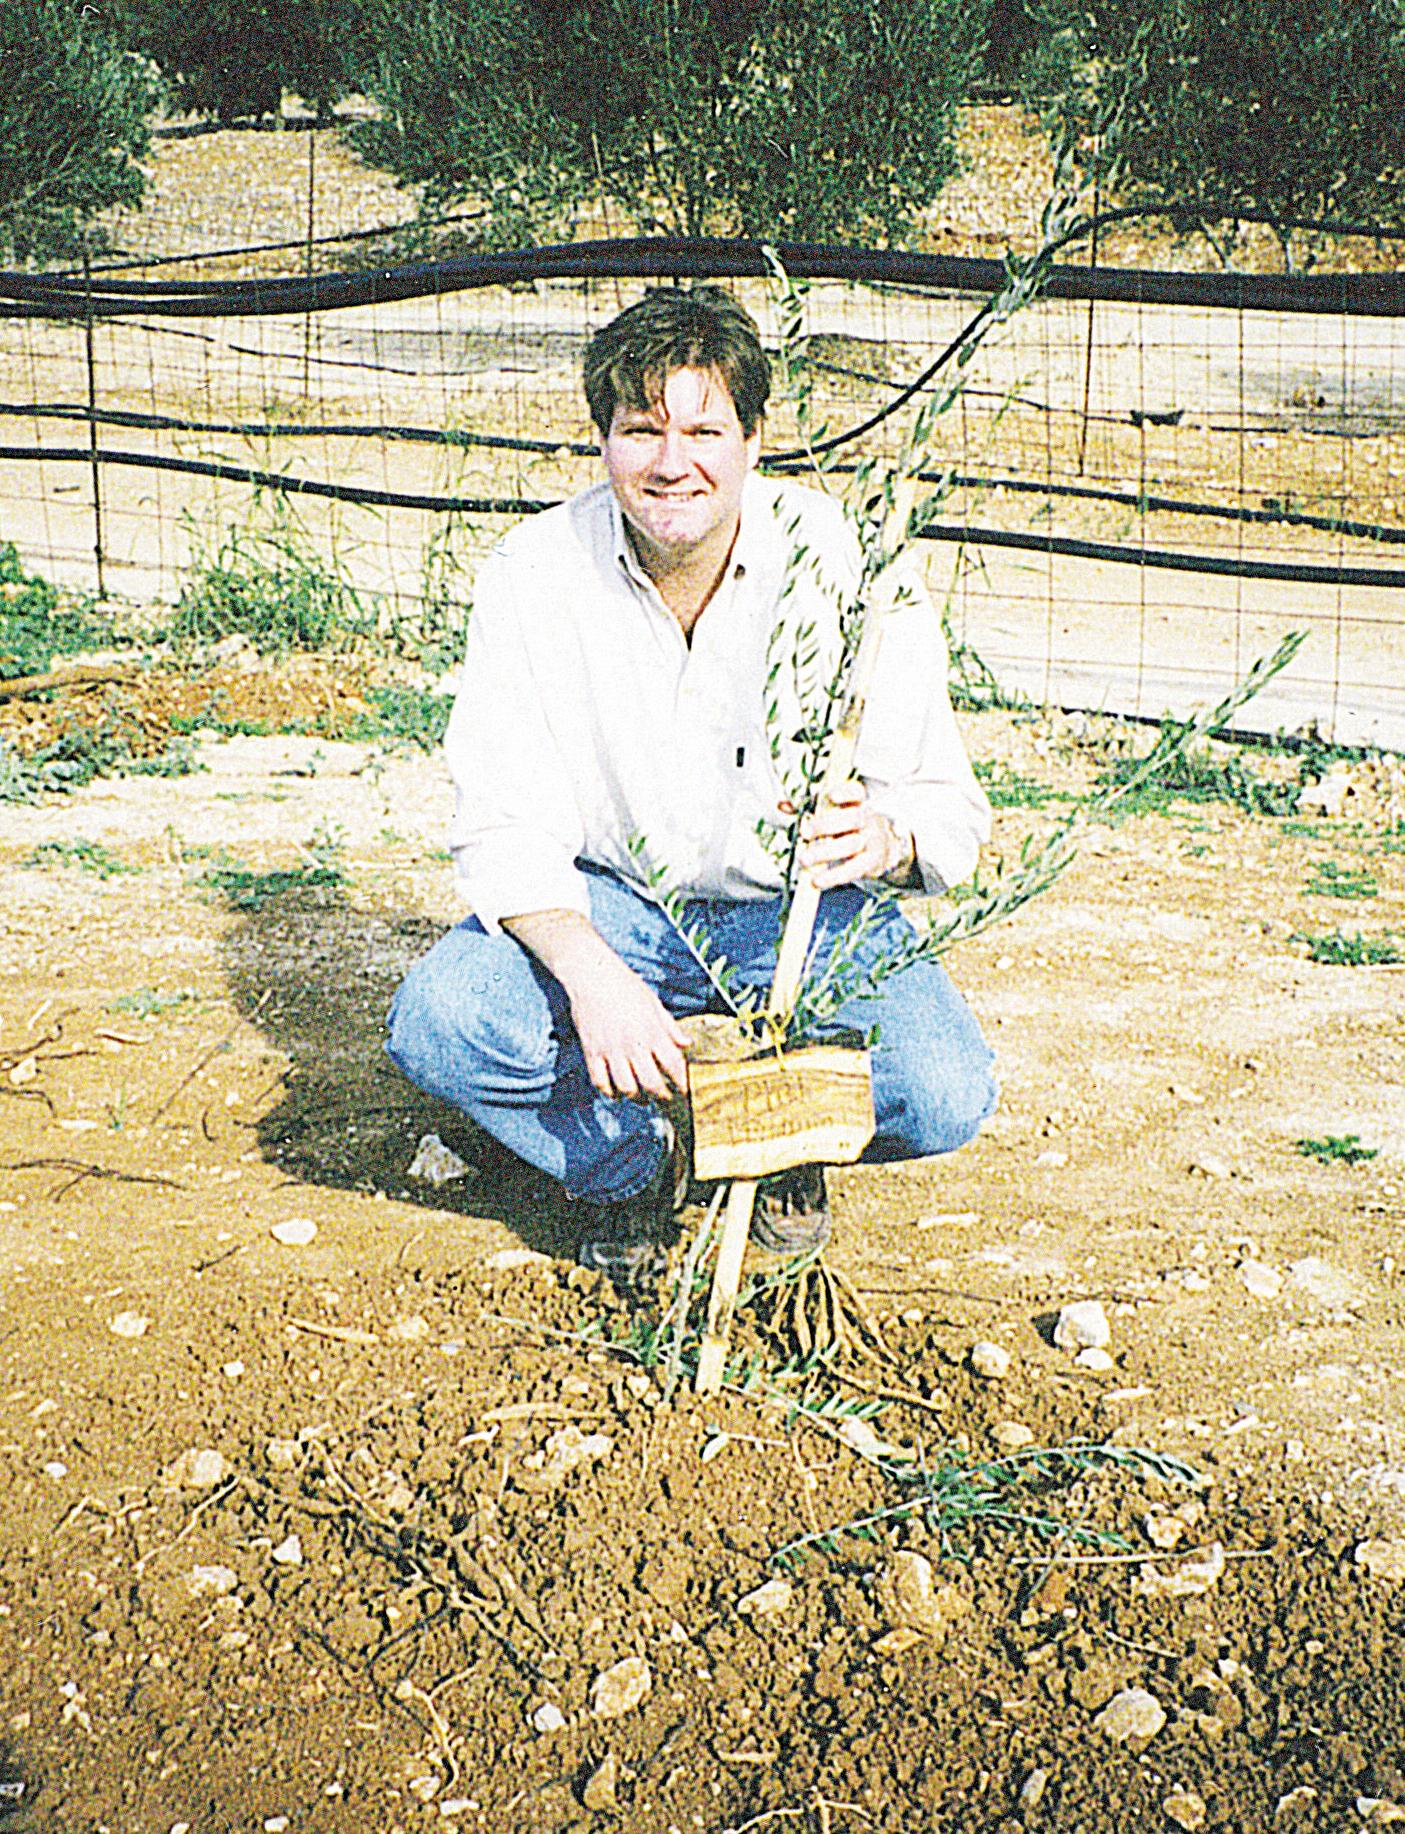 Phil planting a tree.jpg